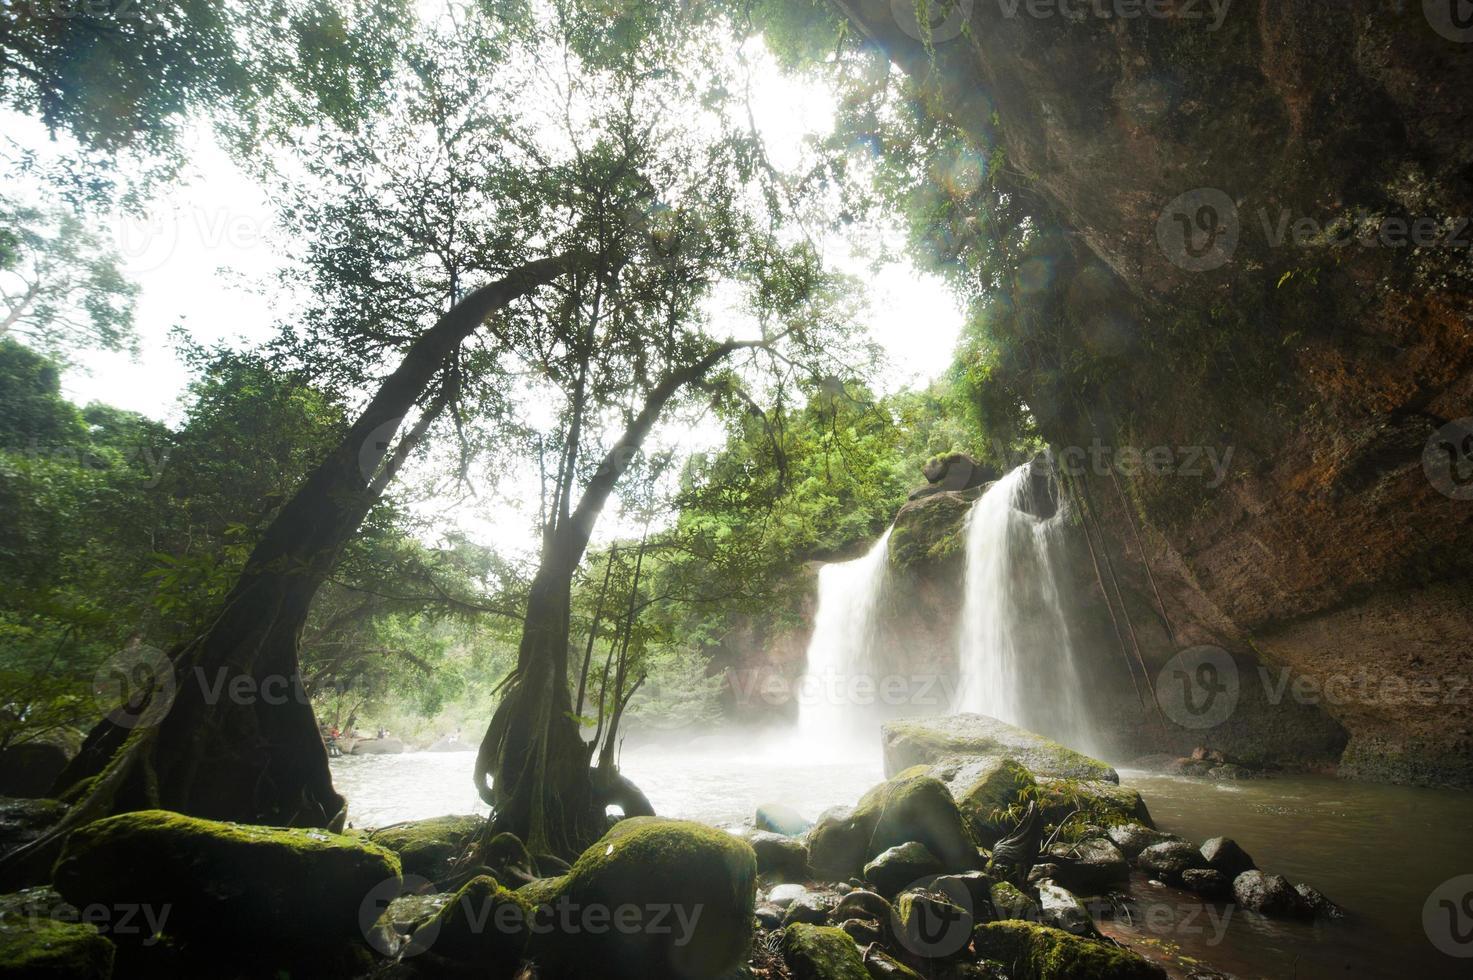 haew suwat vattenfall i Khao Yai National Park, Thailand. foto